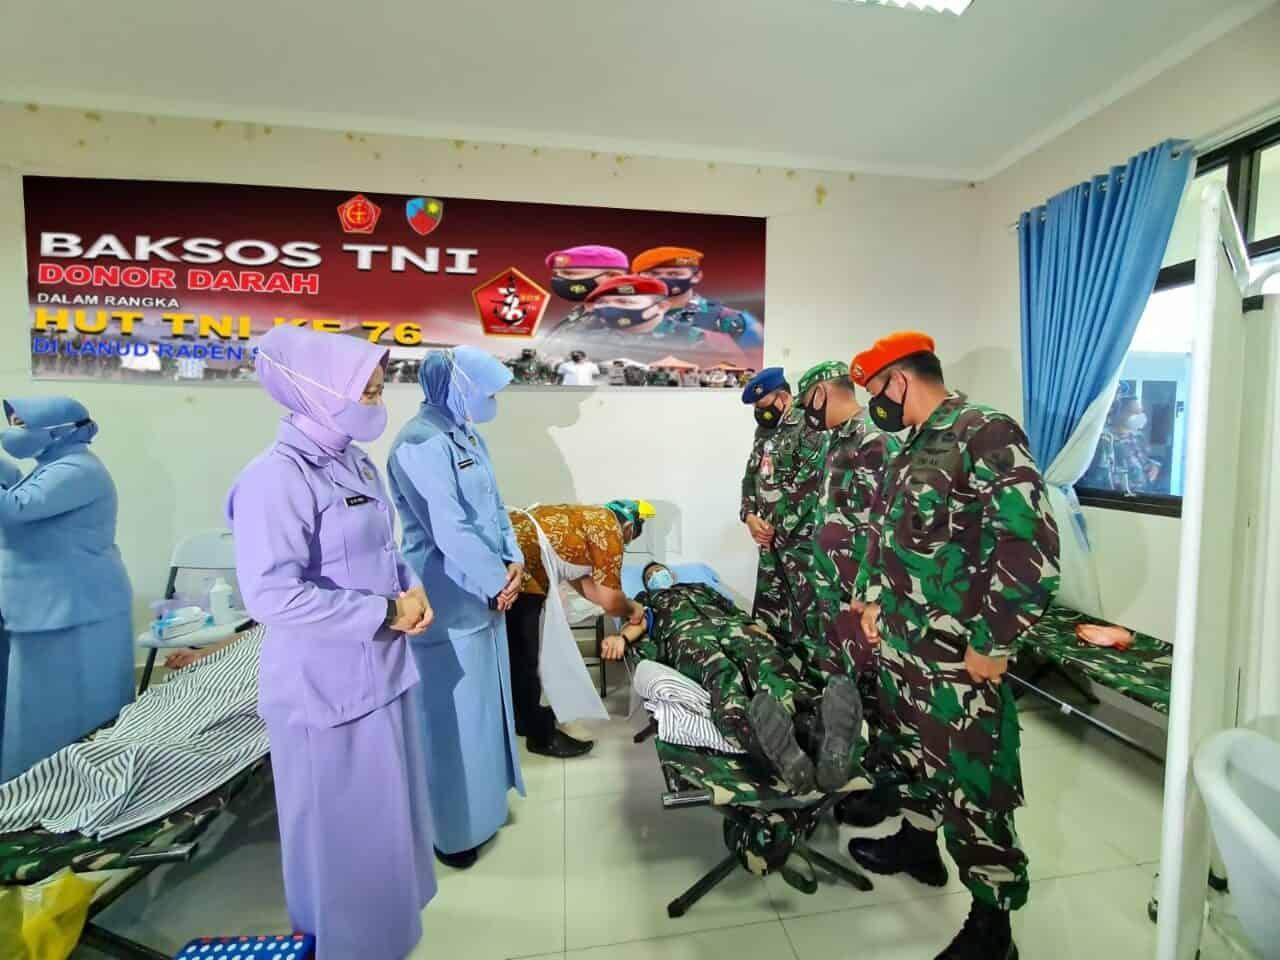 Lanud Raden Sadjad Gelar Baksos Donor Darah Jelang HUT TNI ke 76